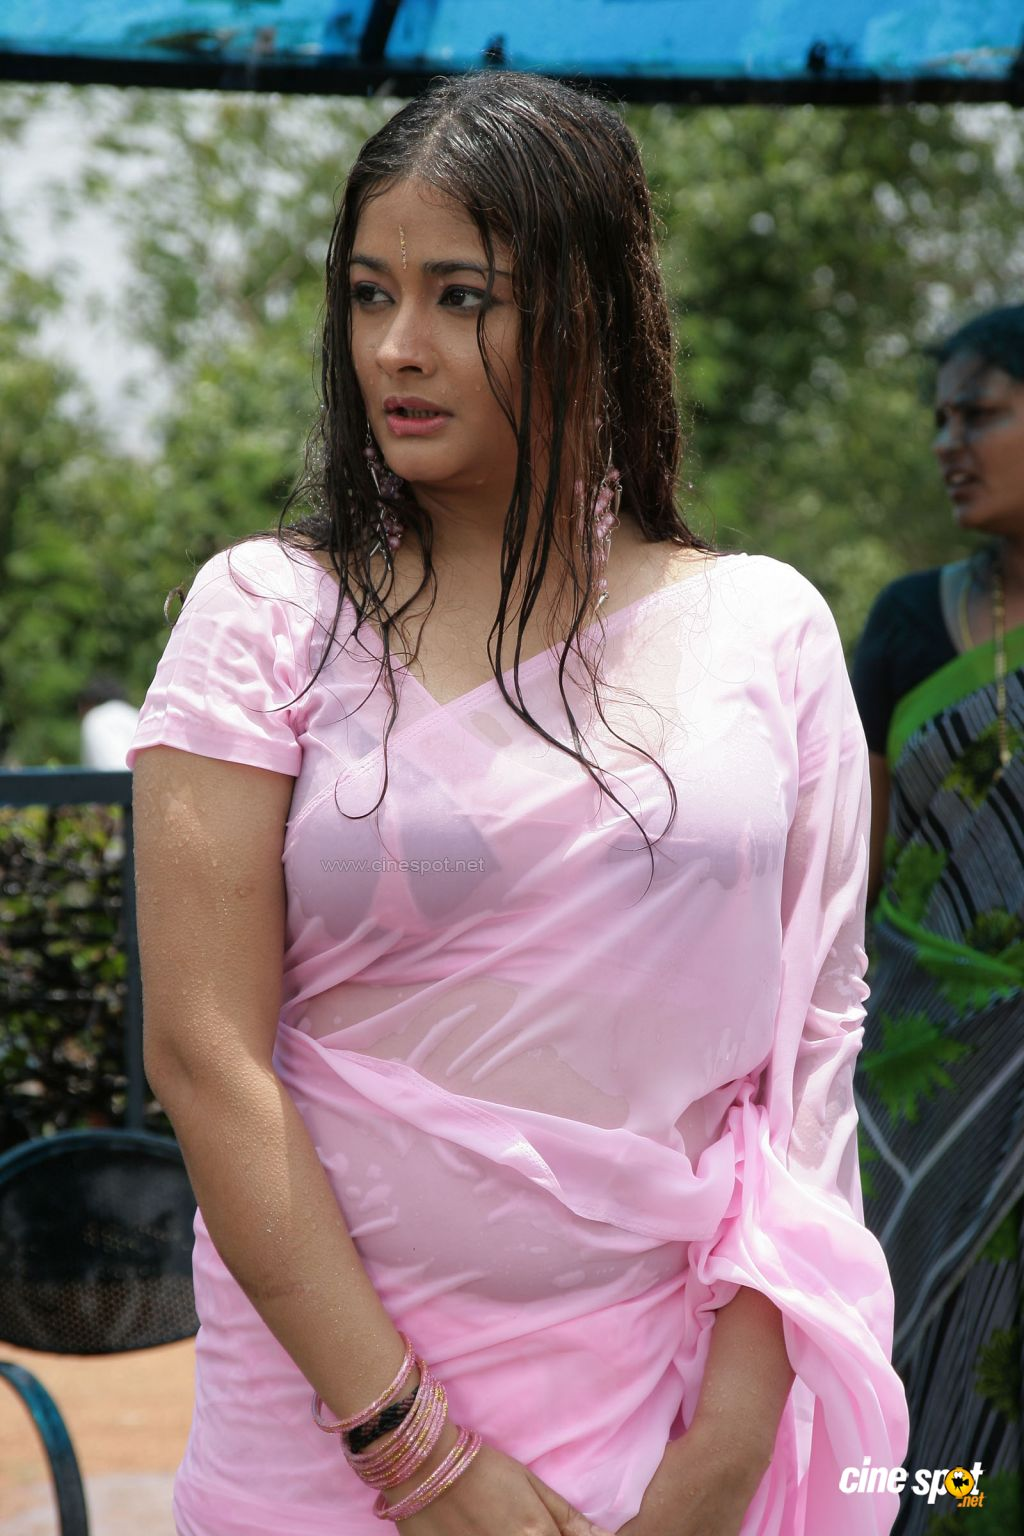 http://3.bp.blogspot.com/-dRIda6W7wTk/TzKqEx2nN8I/AAAAAAAAEuk/o2VvN_iwNPM/s1600/High+School+Telugu+Movie,+Photos,+(3).jpg